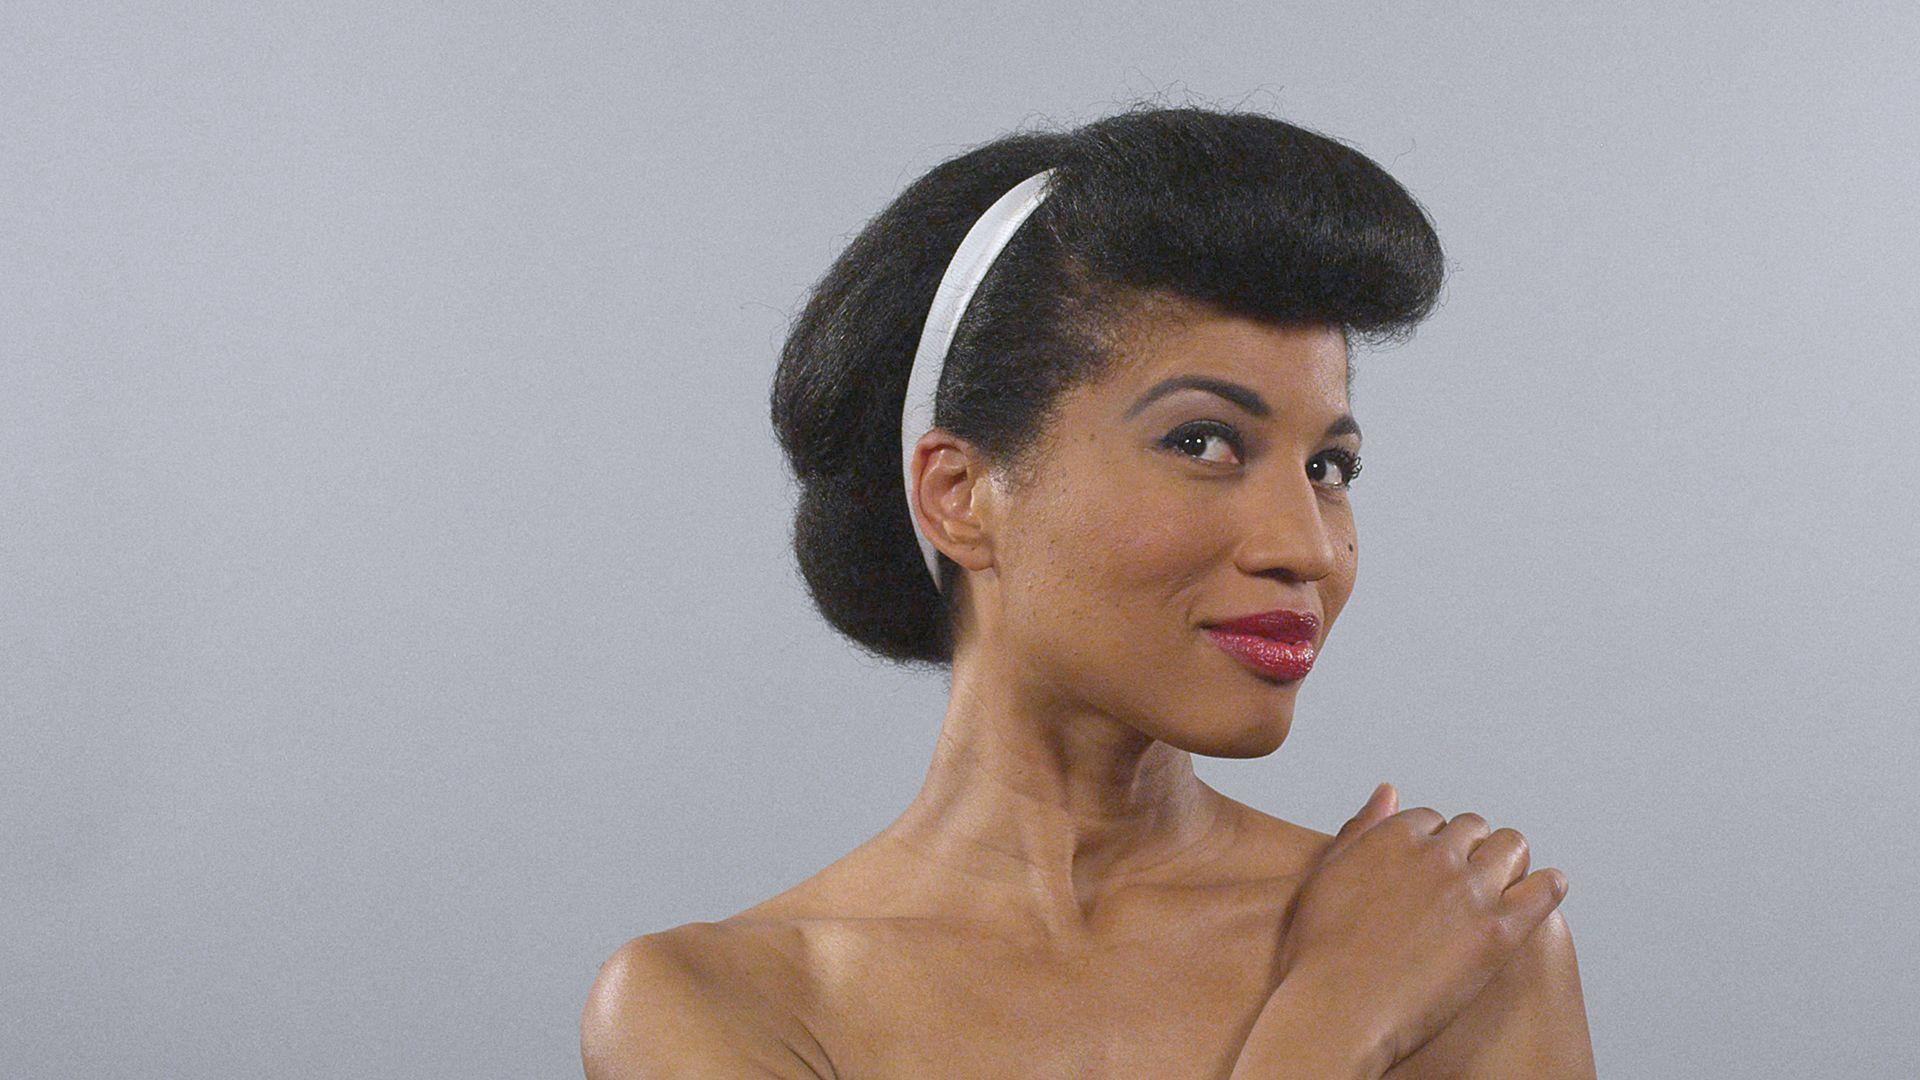 1950s #hair #makeup #blackwomen #style #fashion #hairstyle ...